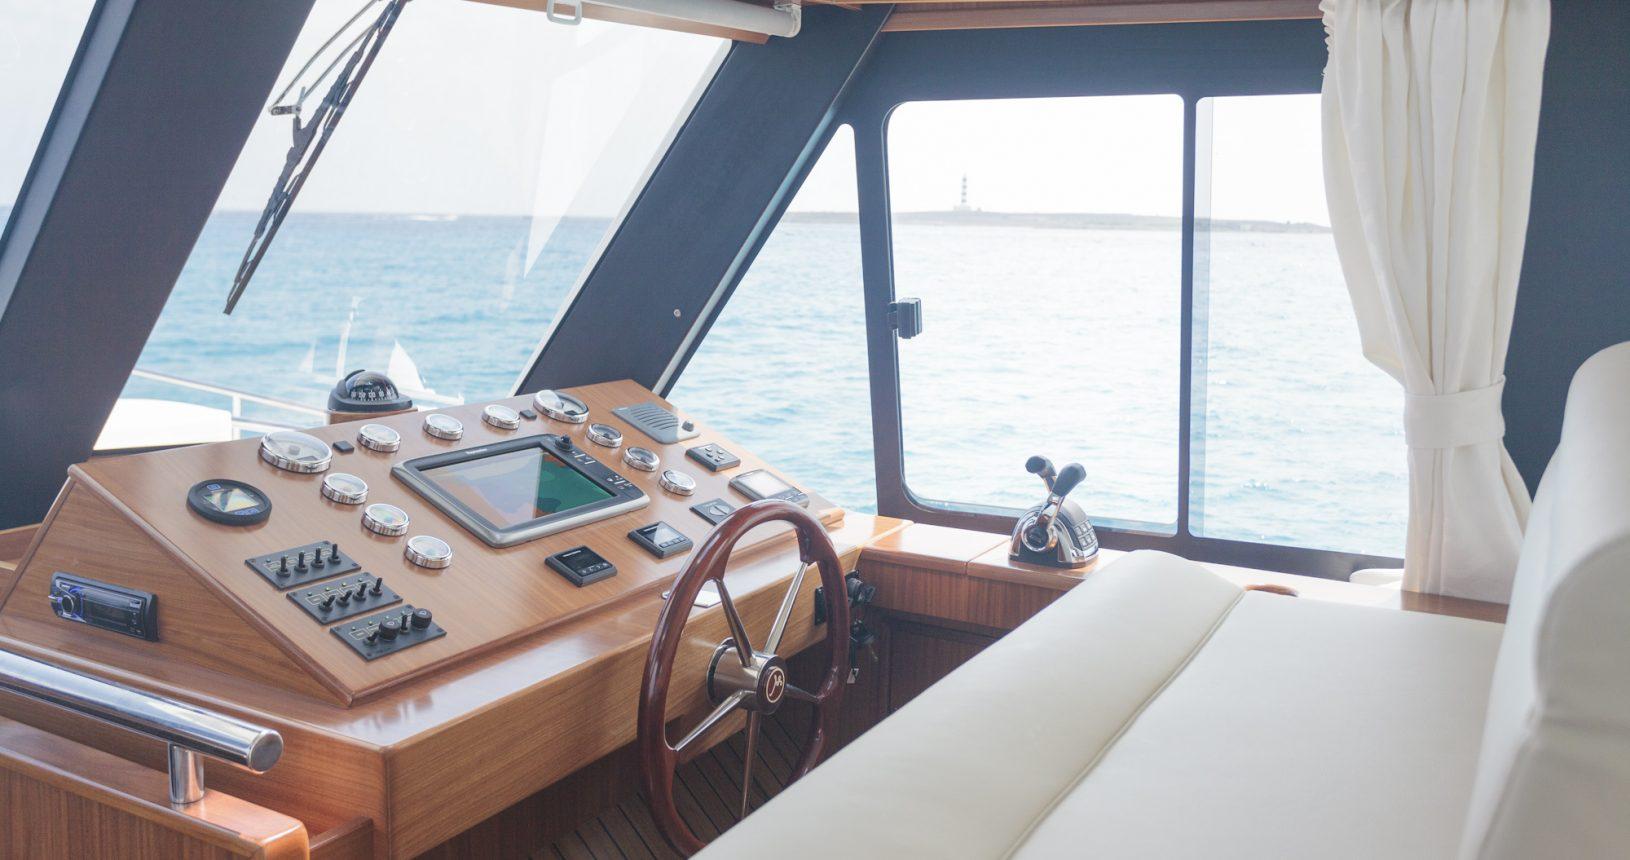 Minorca Islander 54 yacht for sale - helm